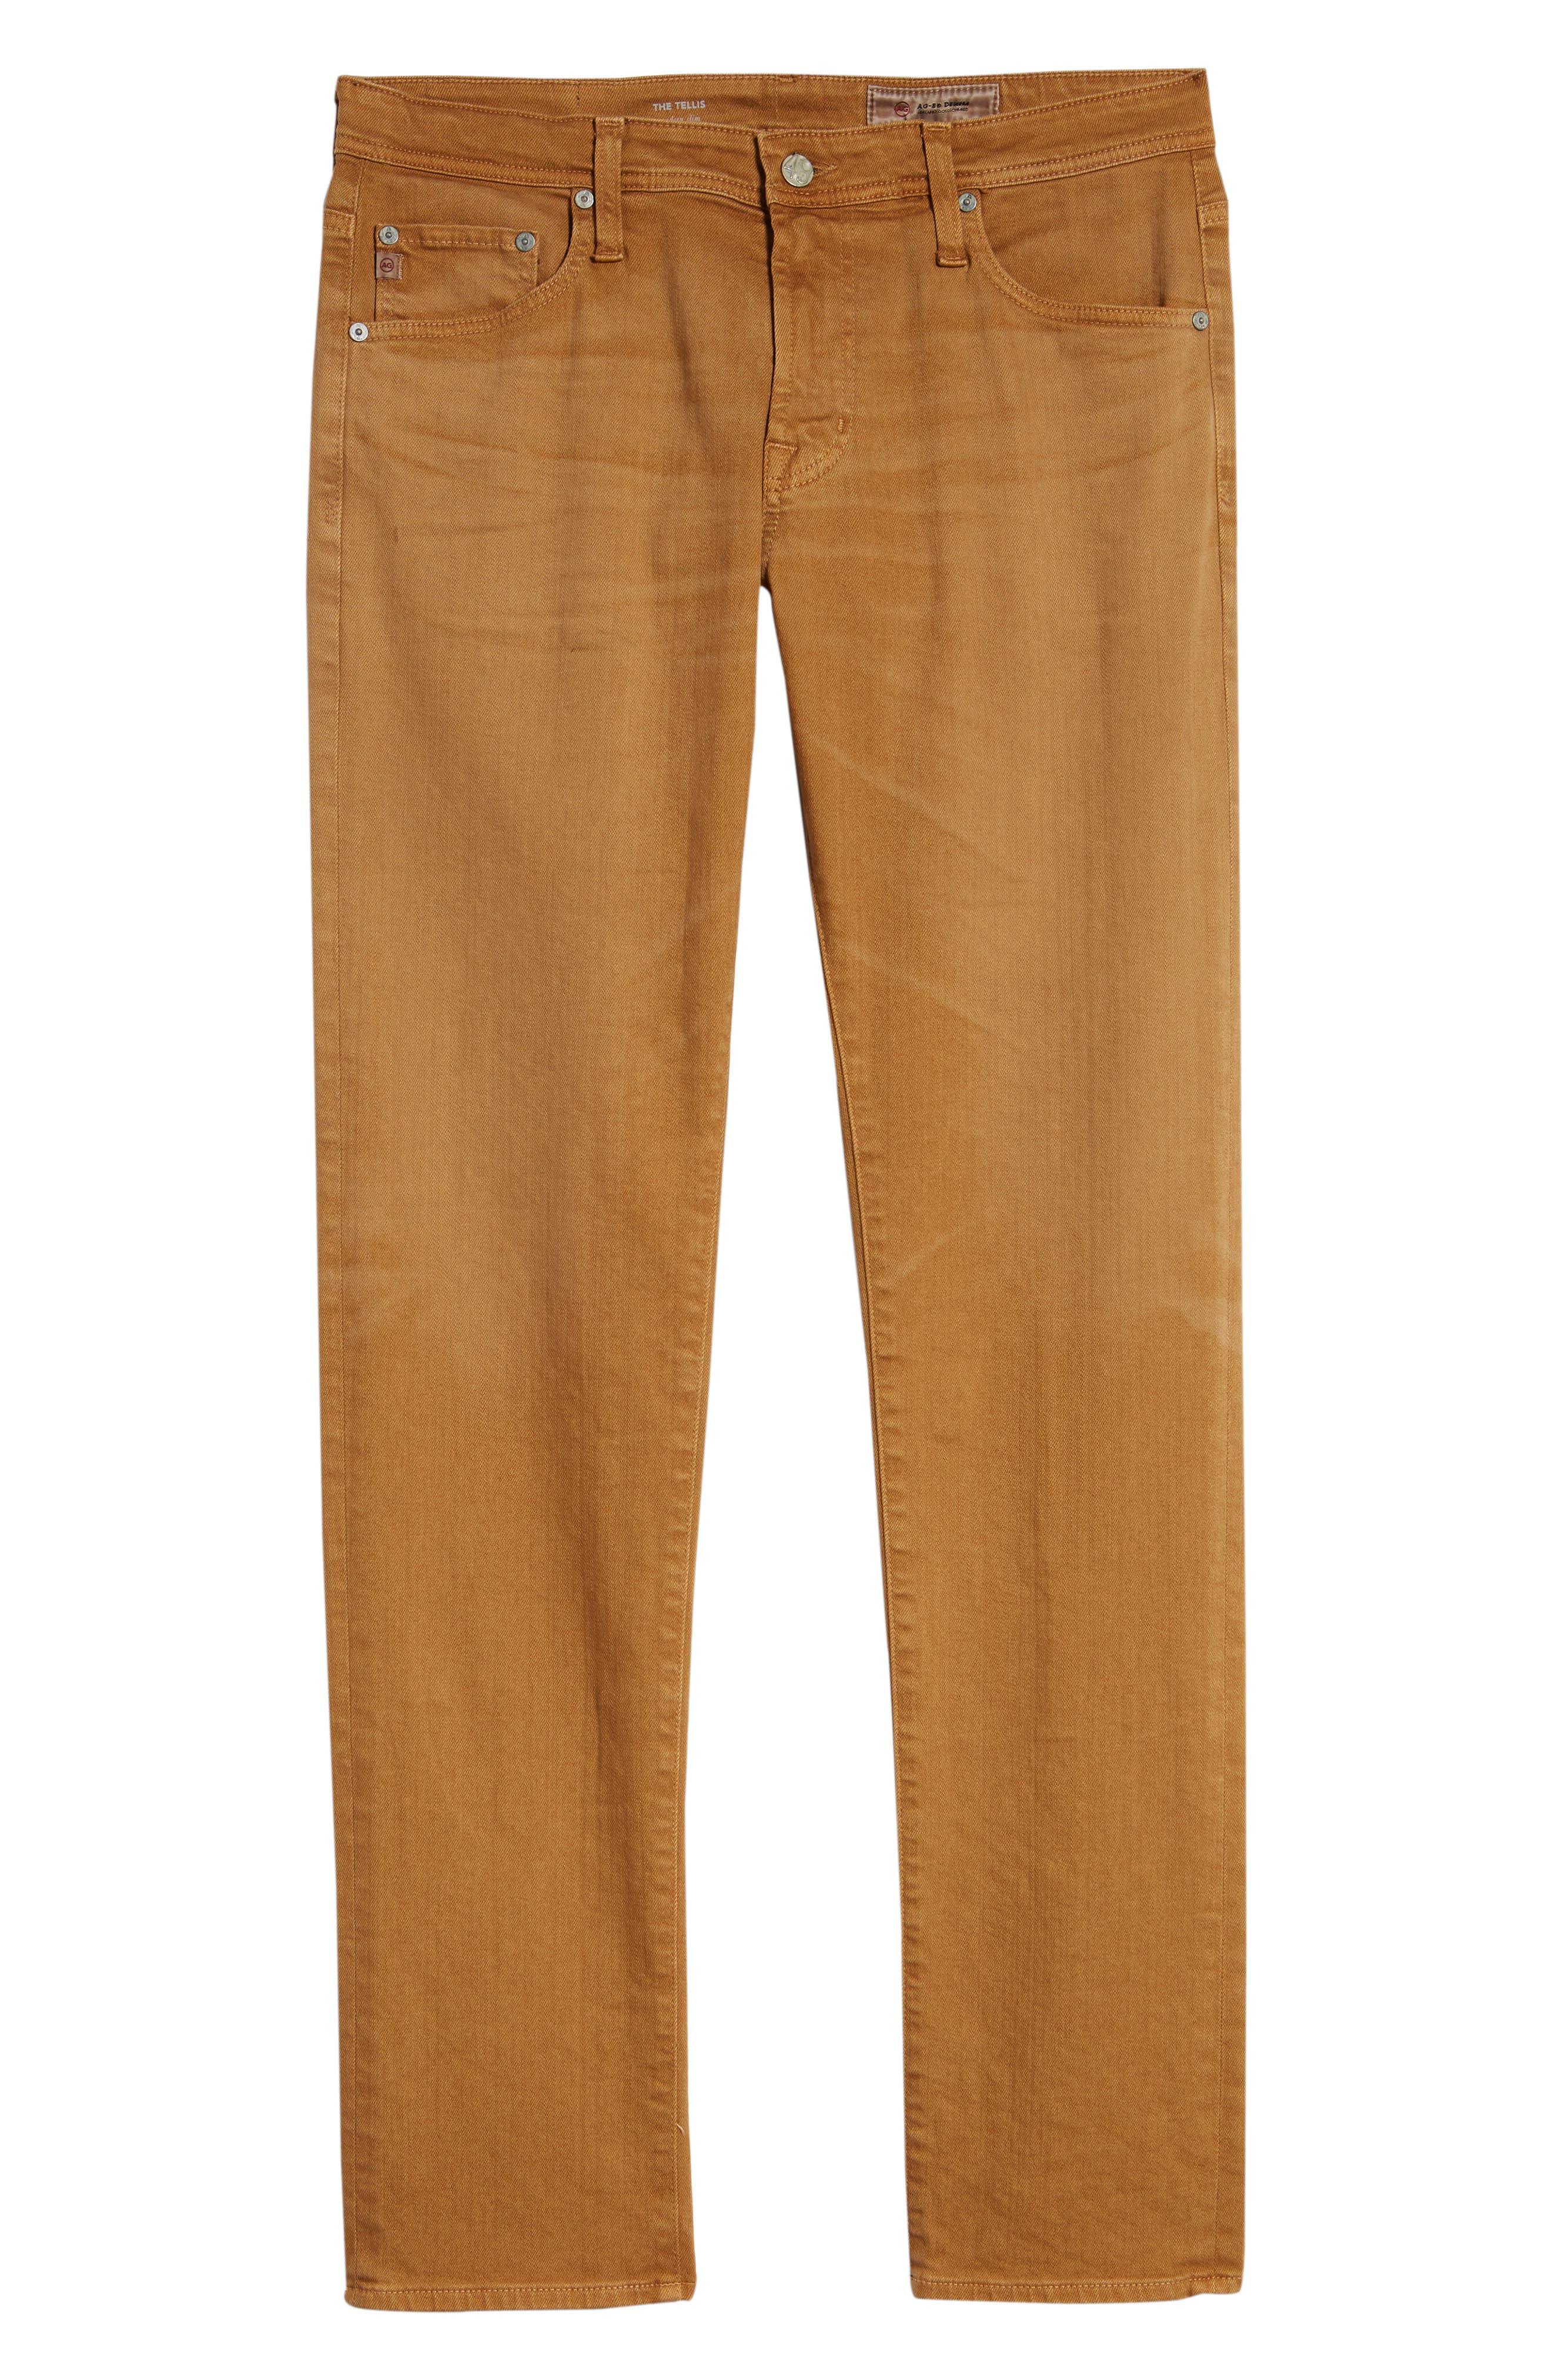 Tellis Slim Fit Jeans,                             Alternate thumbnail 6, color,                             7 YEARS TIMBER